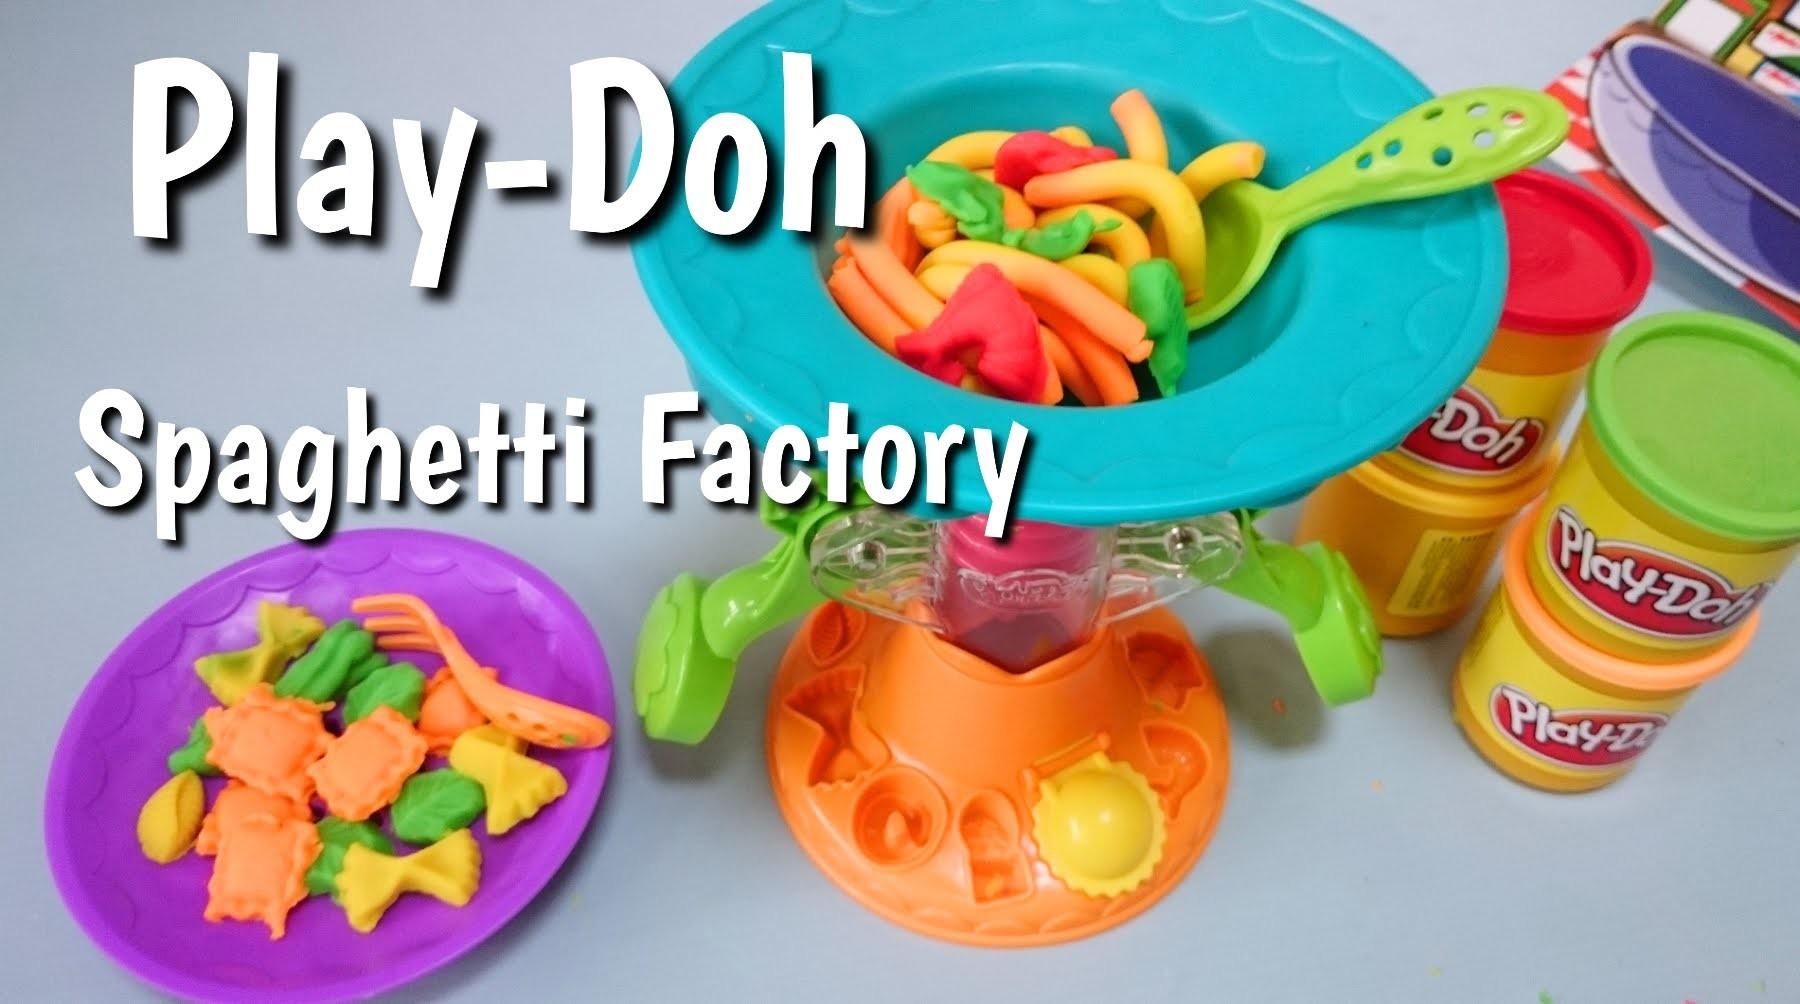 Fabryka spaghetti Play-Doh Spaghetti Factory   How to Make Play-Doh Pasta